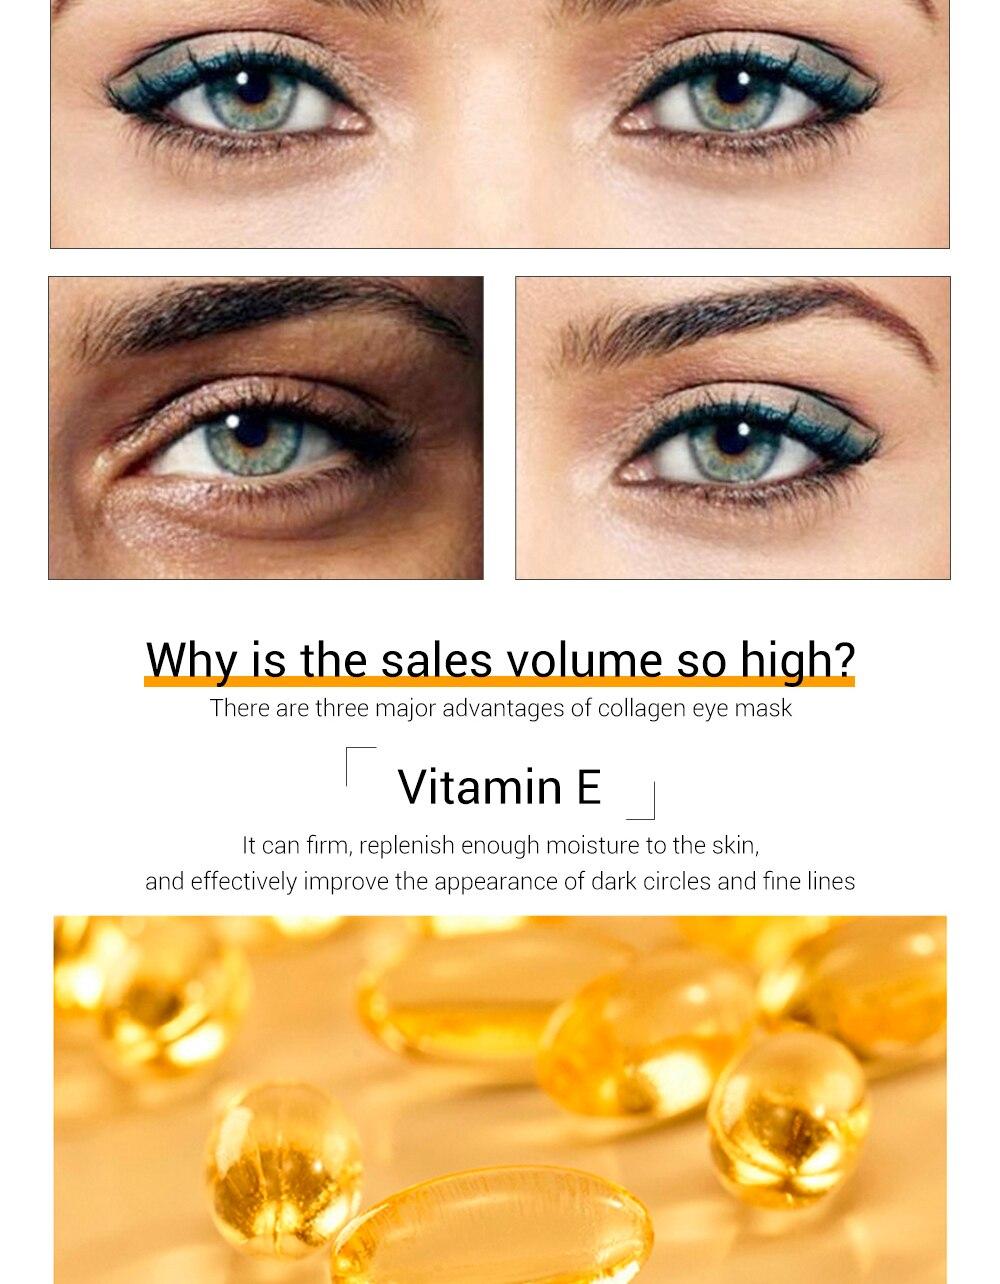 collagen eye mask-4